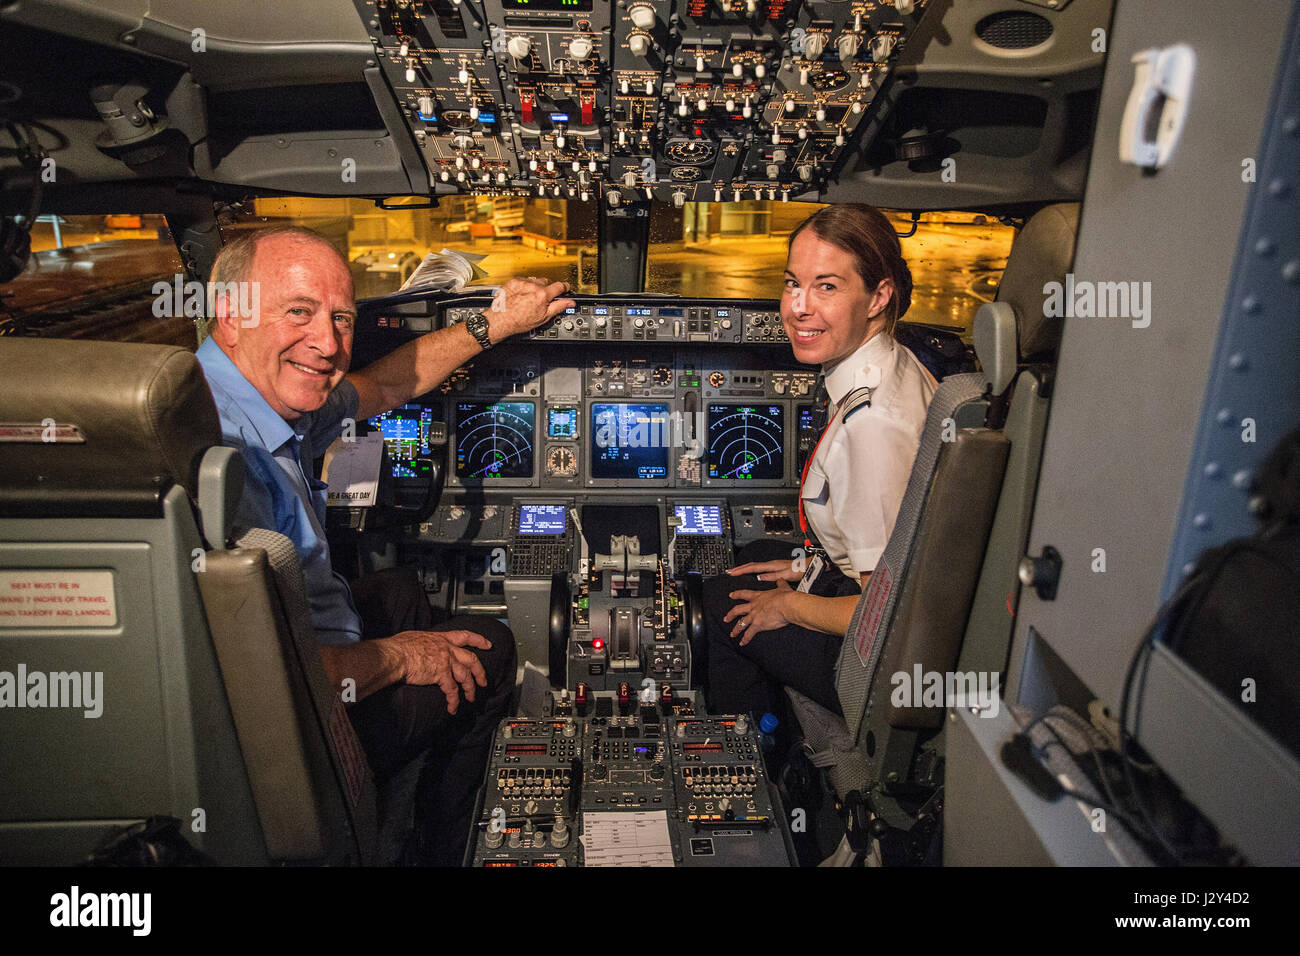 cockpit of modern jetliner with female co-pilot - Stock Image